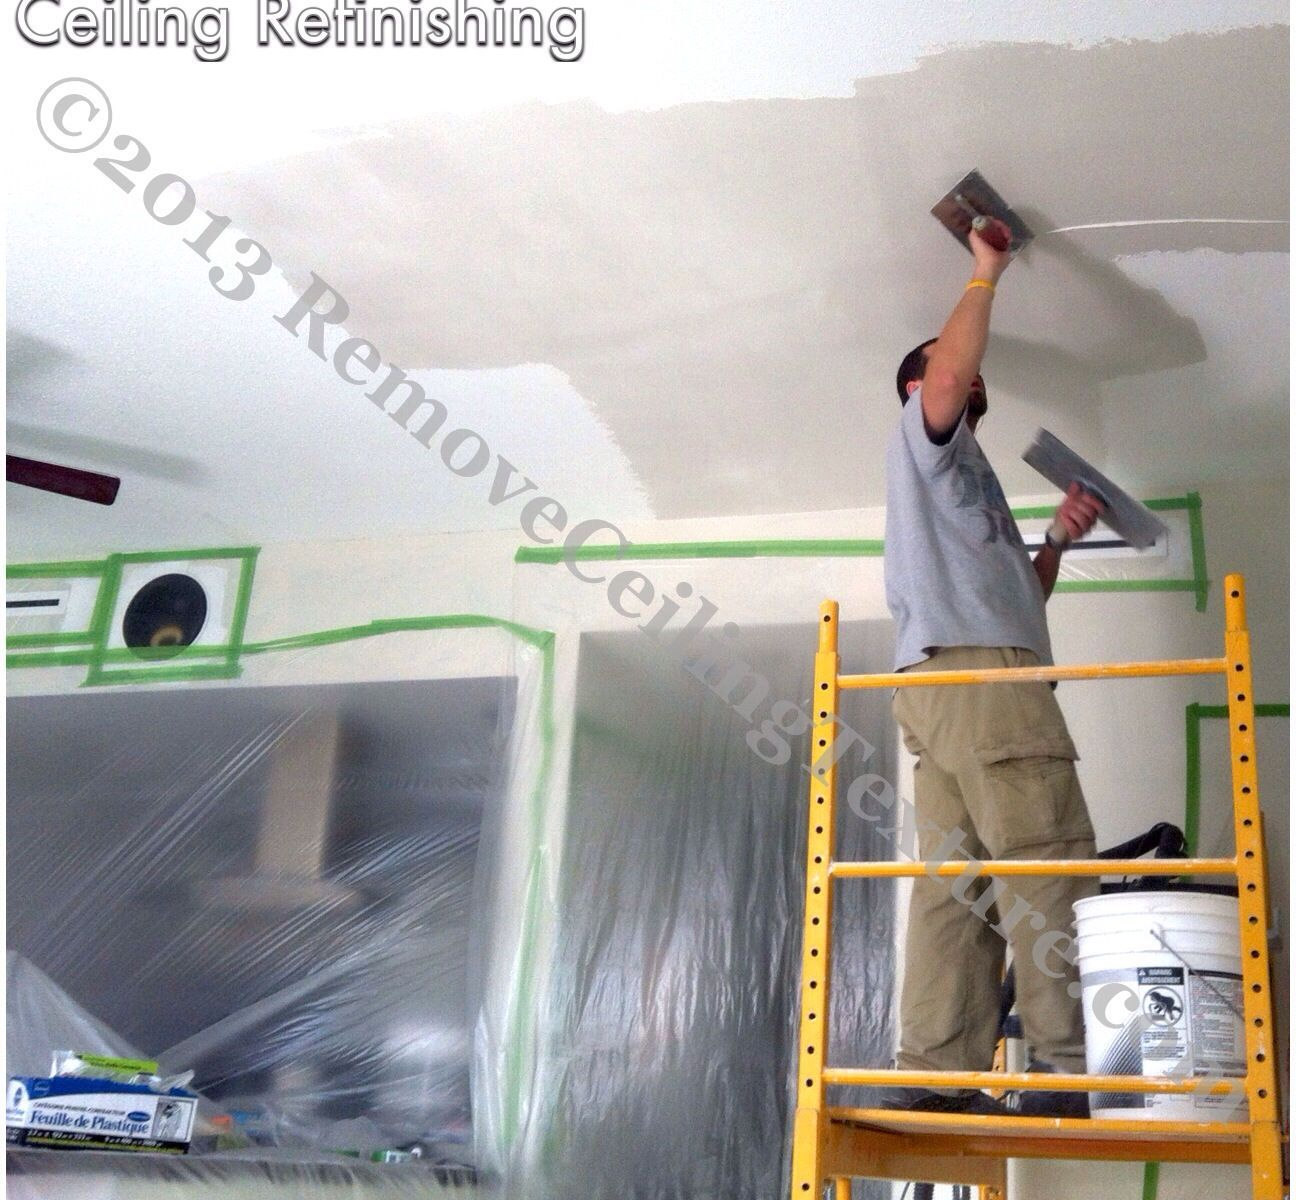 Ceiling refinishing using the same method used by plaster artisans